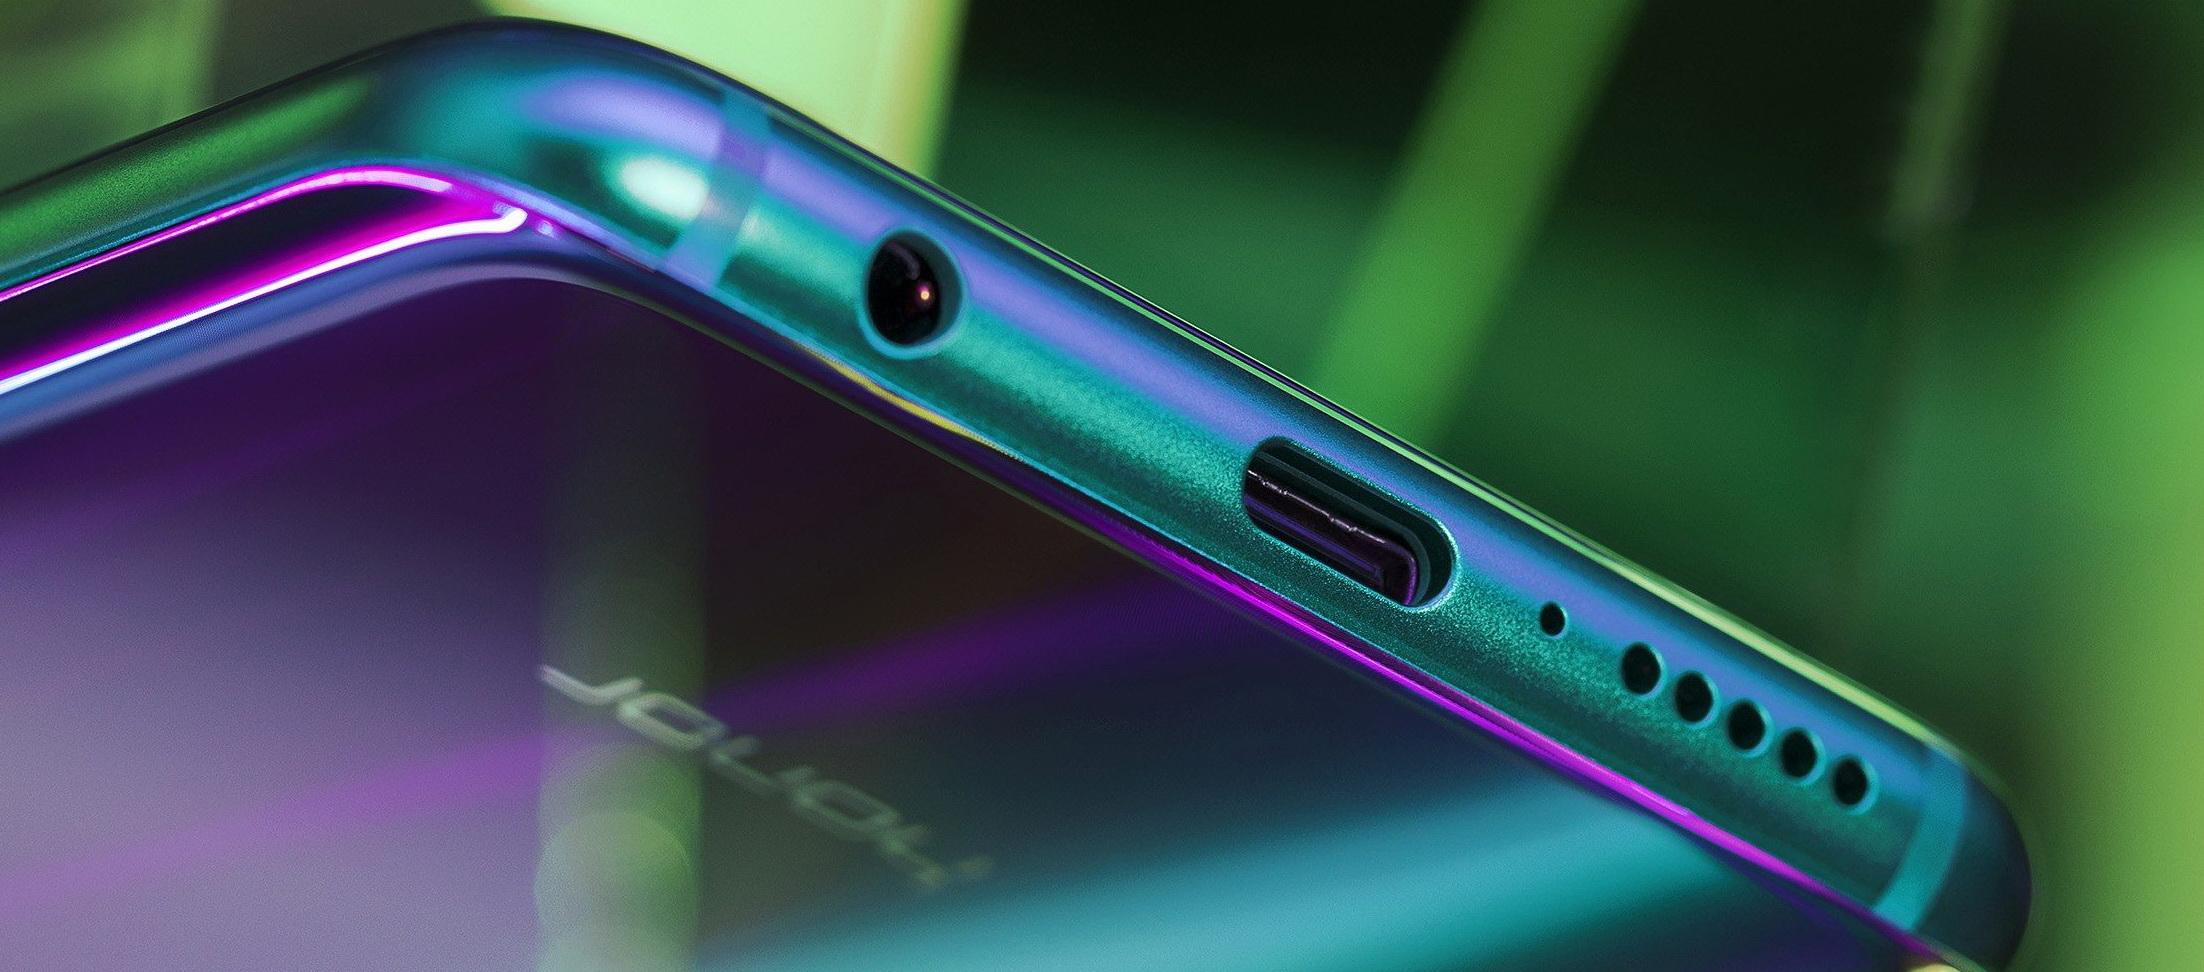 Huawei is testing, Google's Fuchsia OS